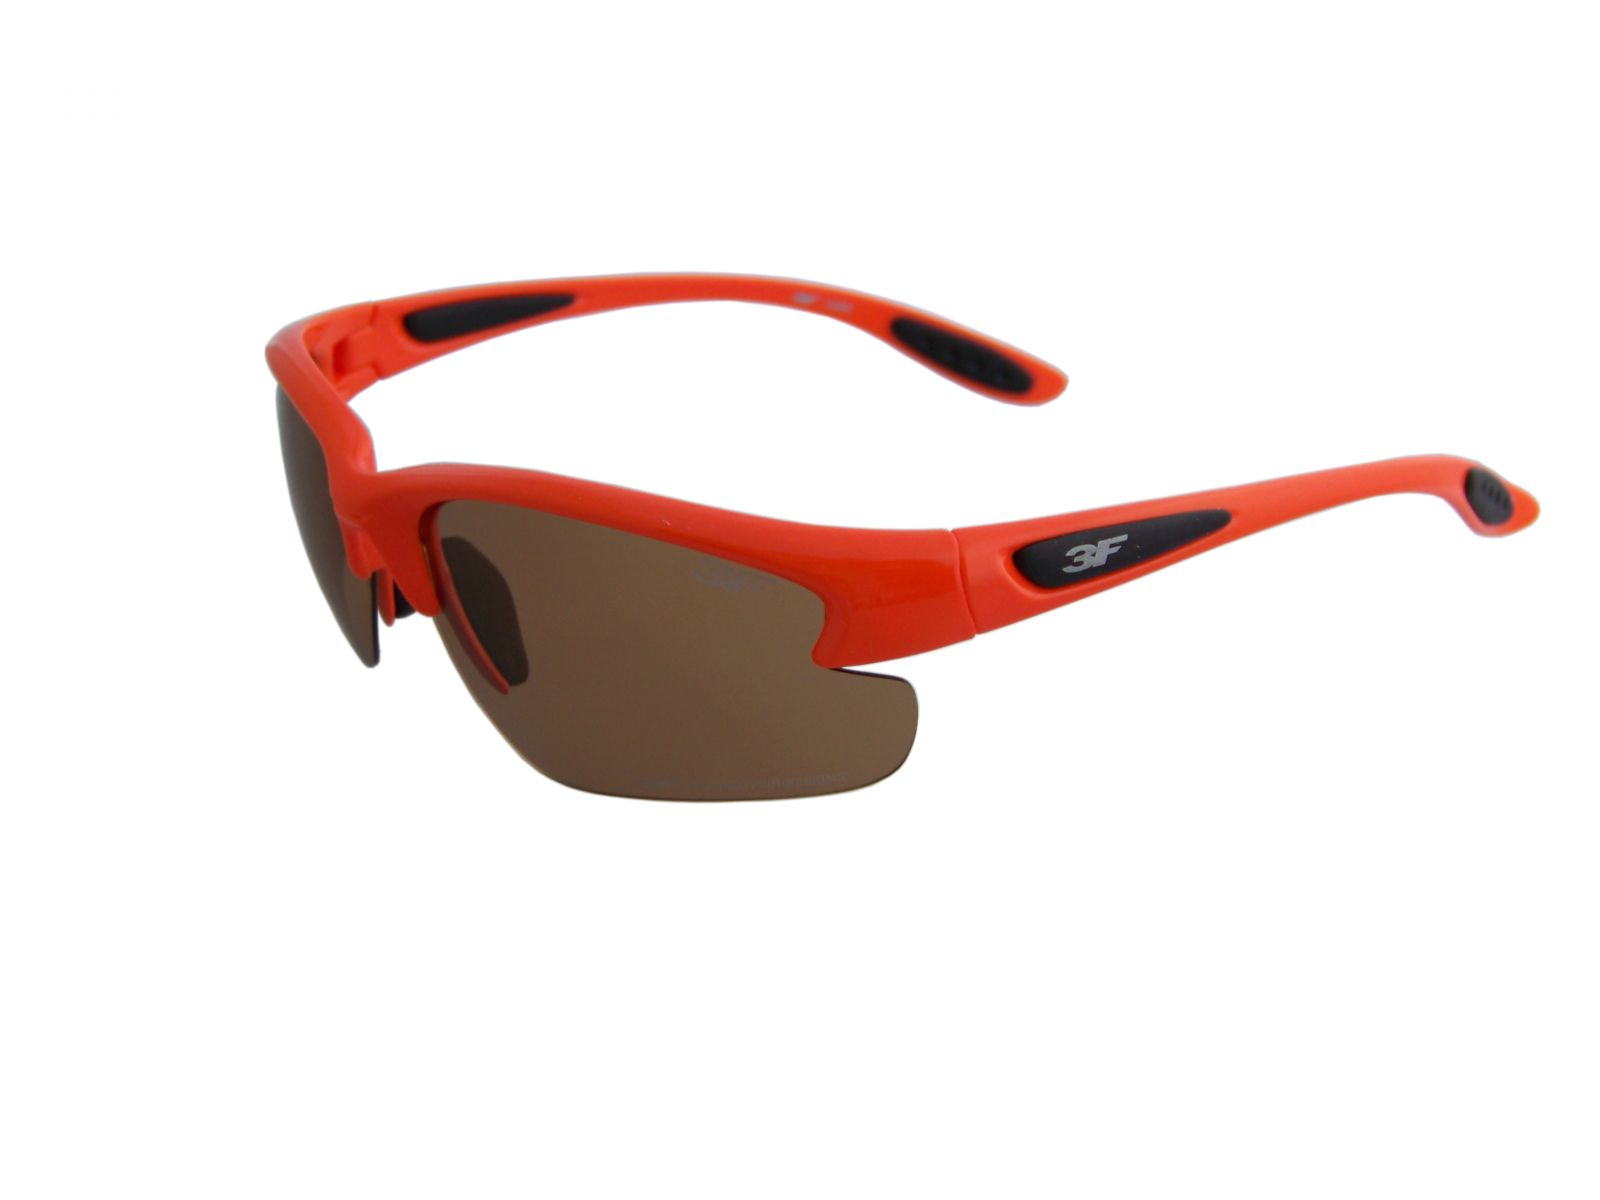 sportovní brýle 3F Photochromic 1465 fotochromatická polarizační čočka + čirá čočka